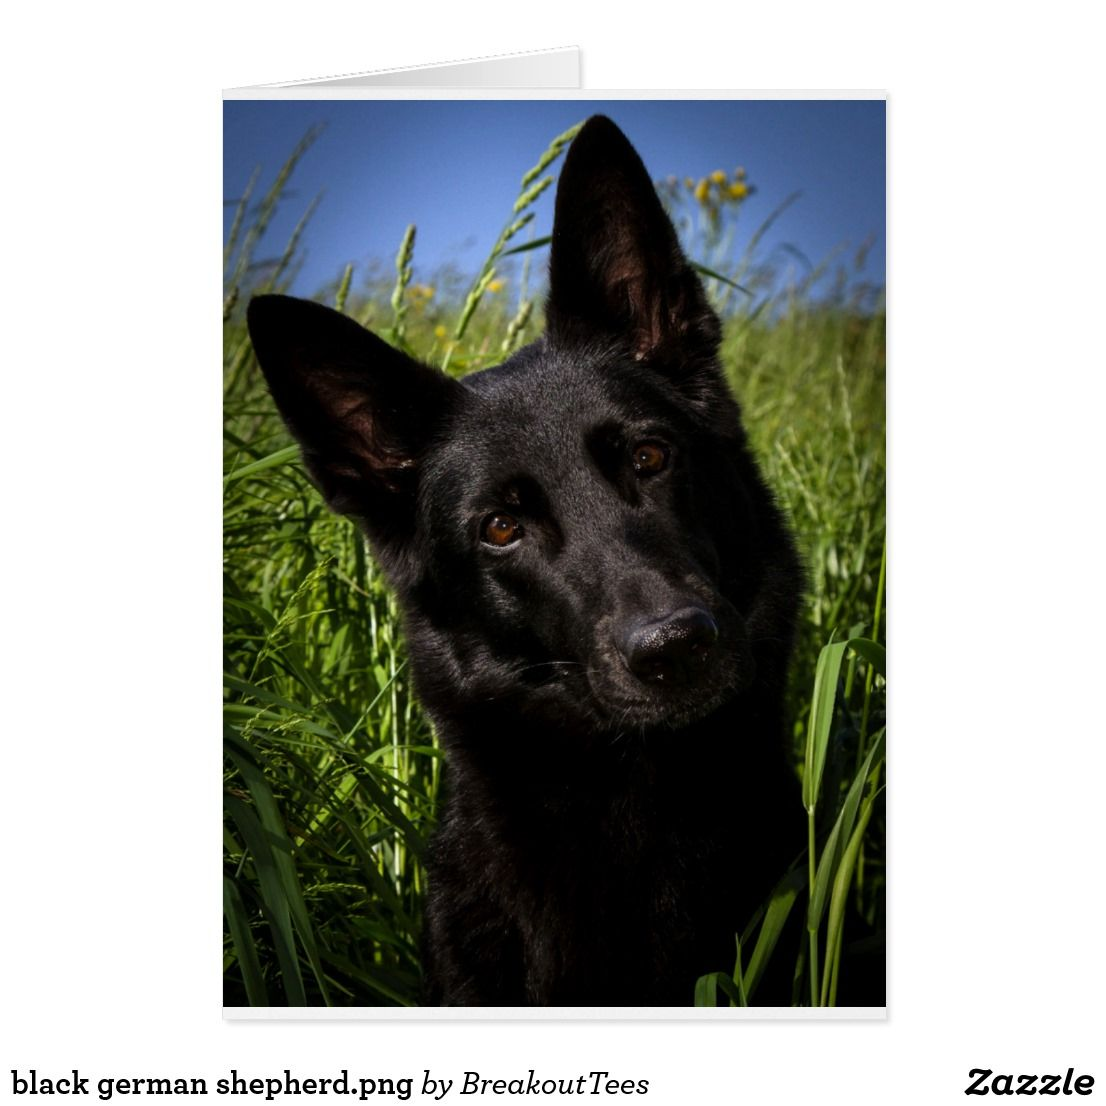 Black German Shepherd Png Black German Shepherd German Shepherd Dogs German Shepherd Puppies